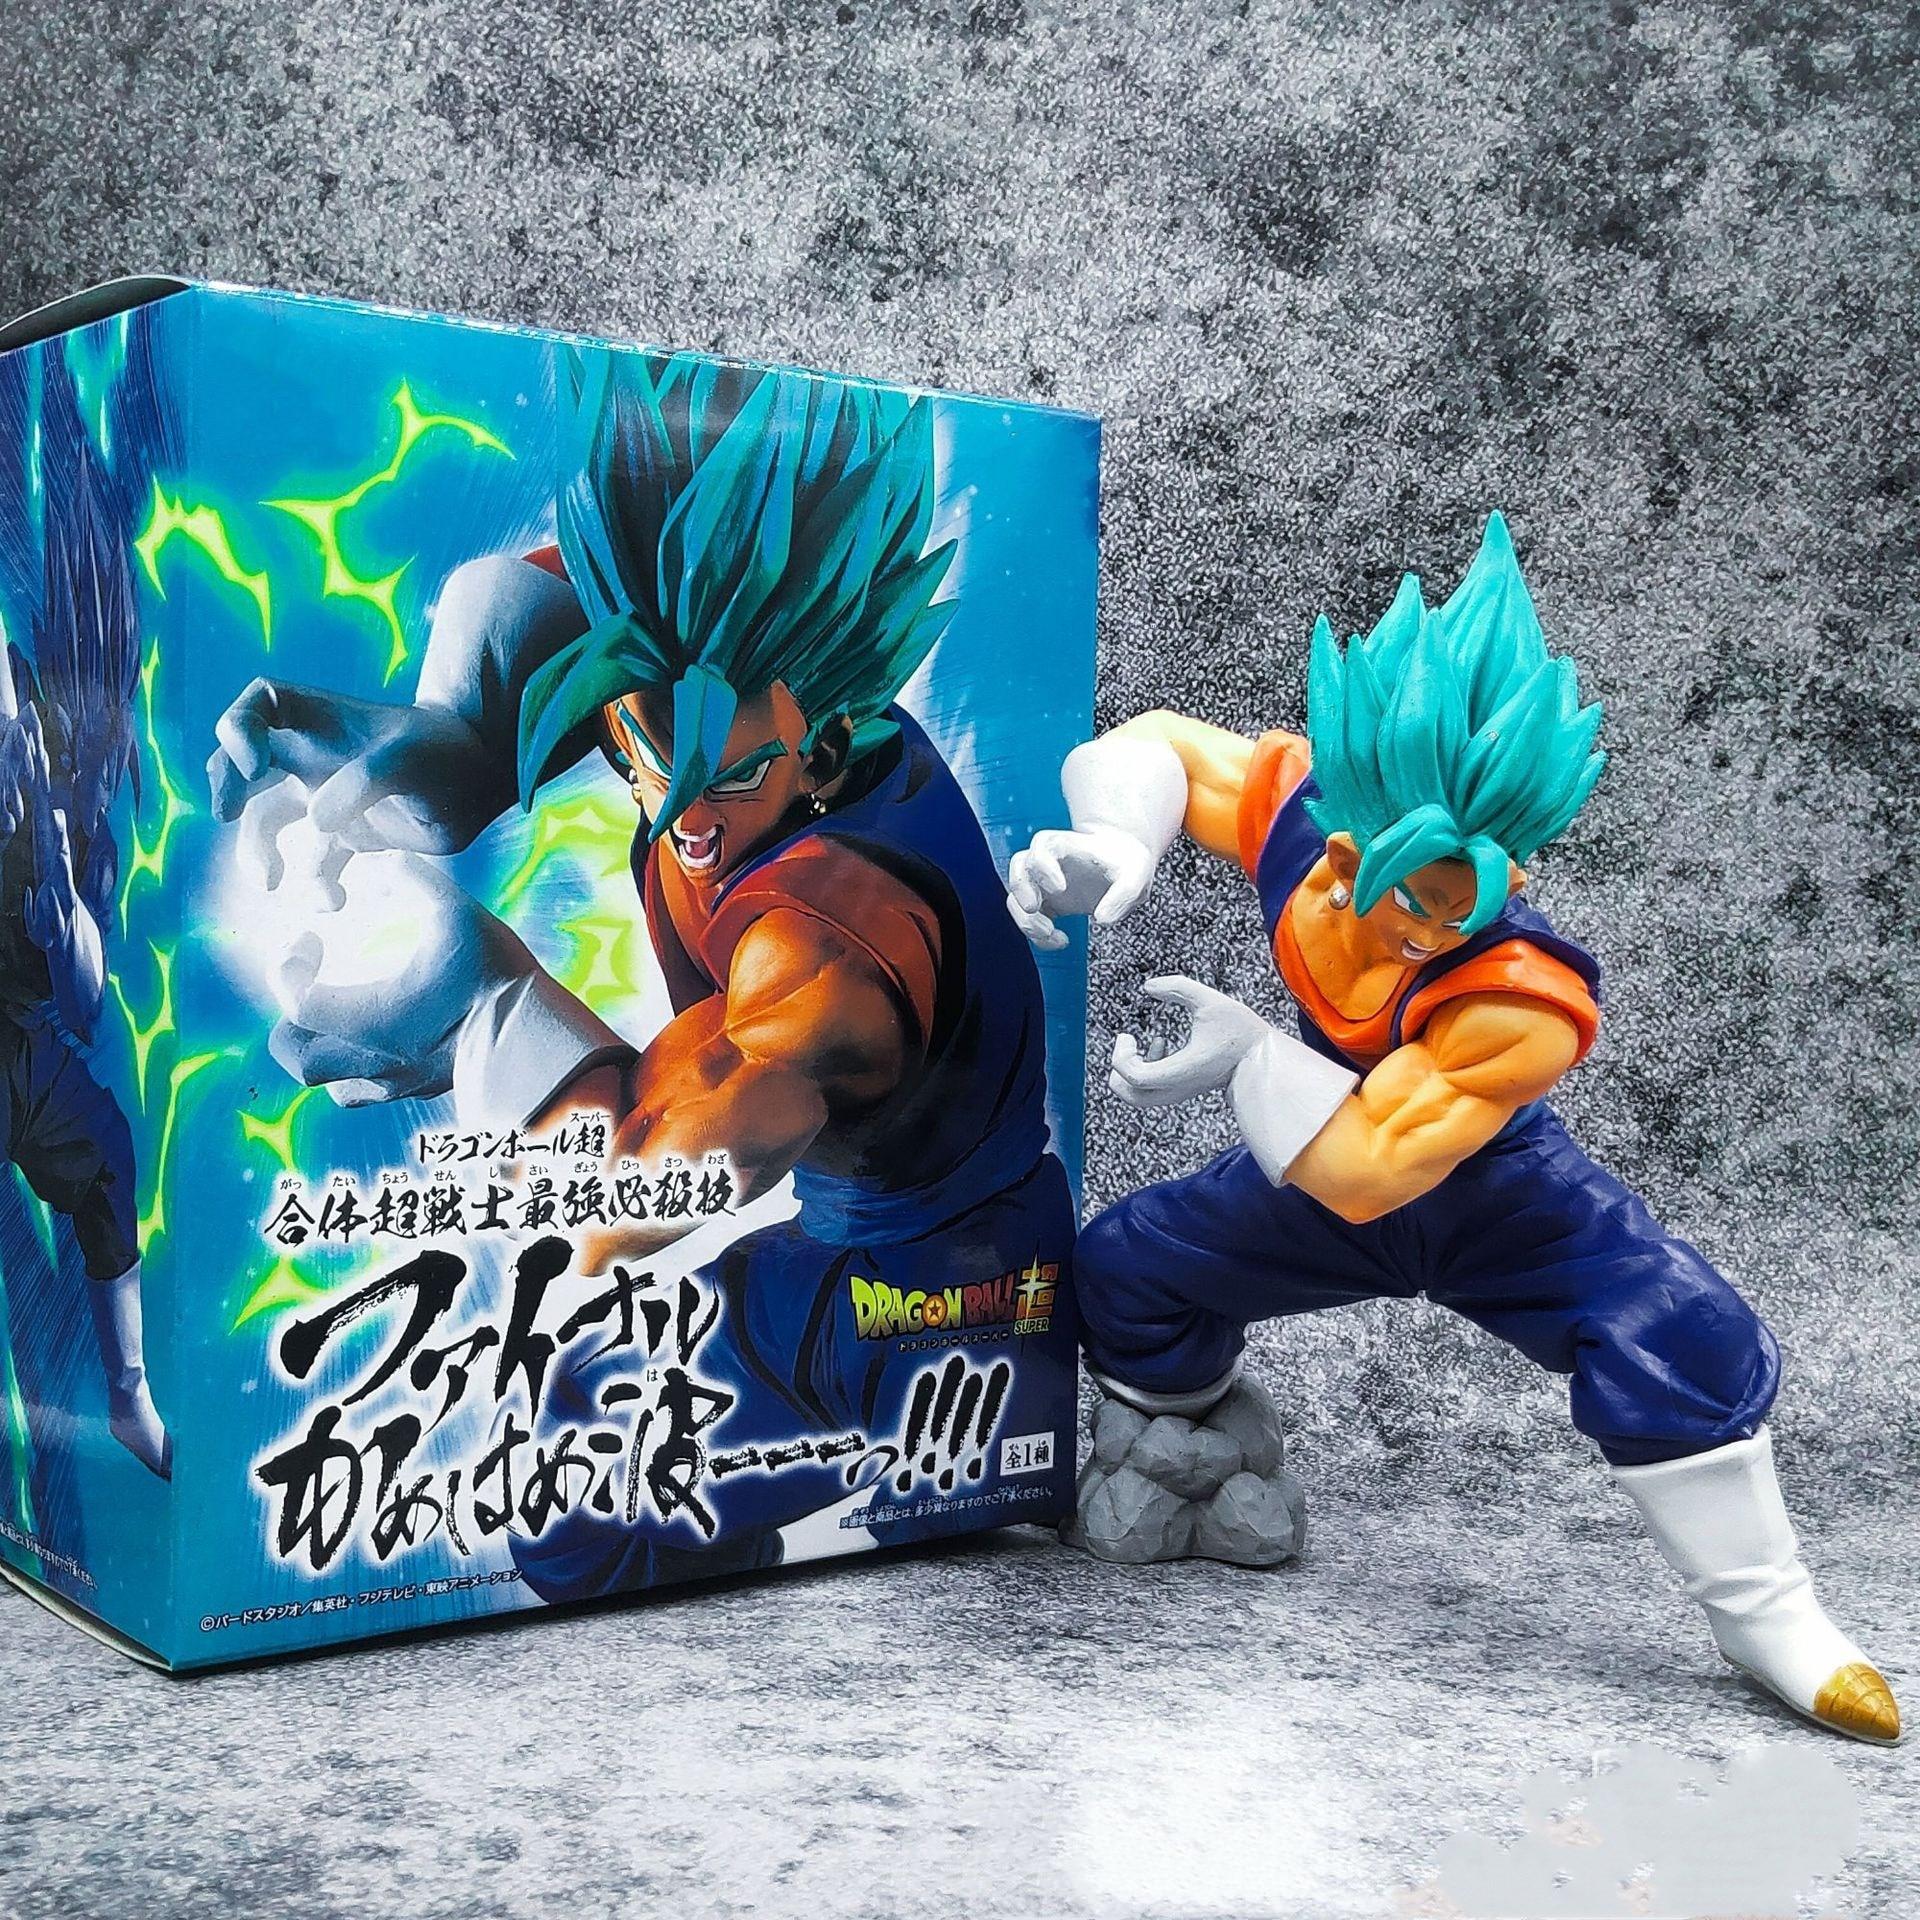 Dragon Ball Super Anime Figures Vegetto Son Goku Vegeta Potara Kamehameha PVC Toys Model Action Figma DBZ Super Saiyan Juguetes